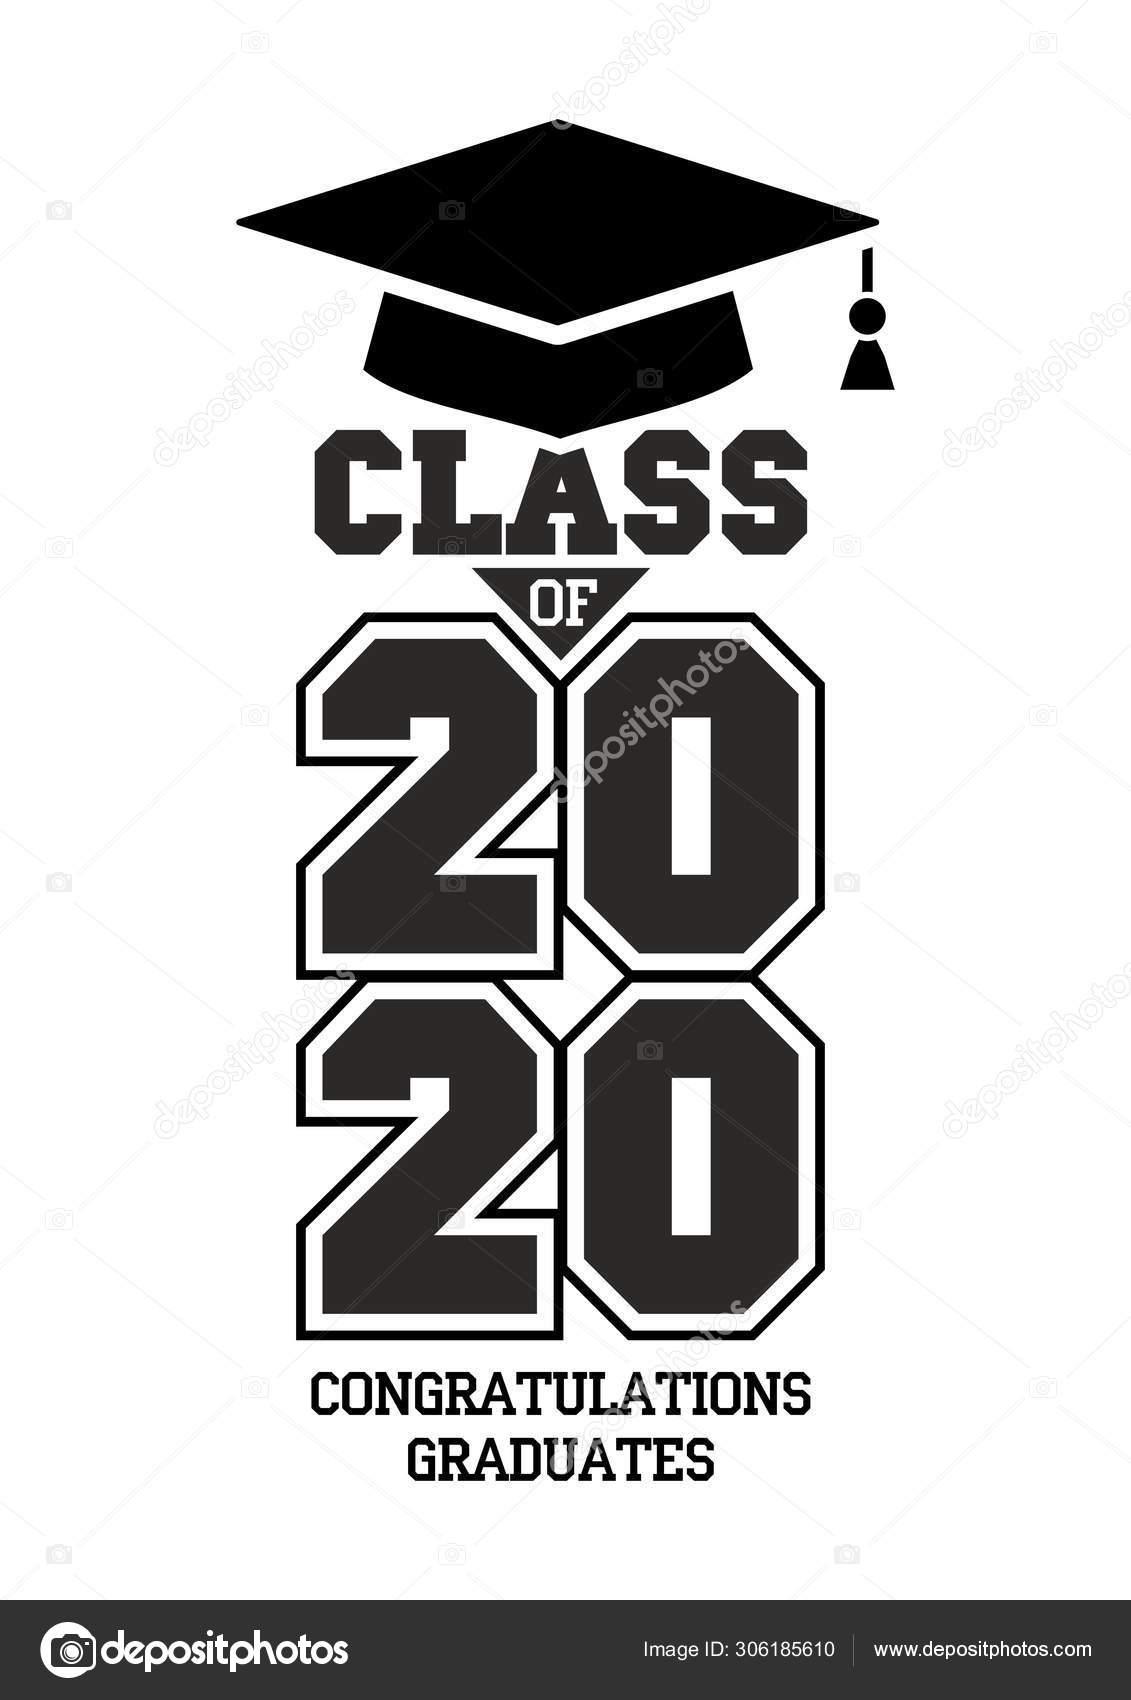 Graduation Schedule 2020.2020 Class Congratulations Graduates Stock Vector C Virtis